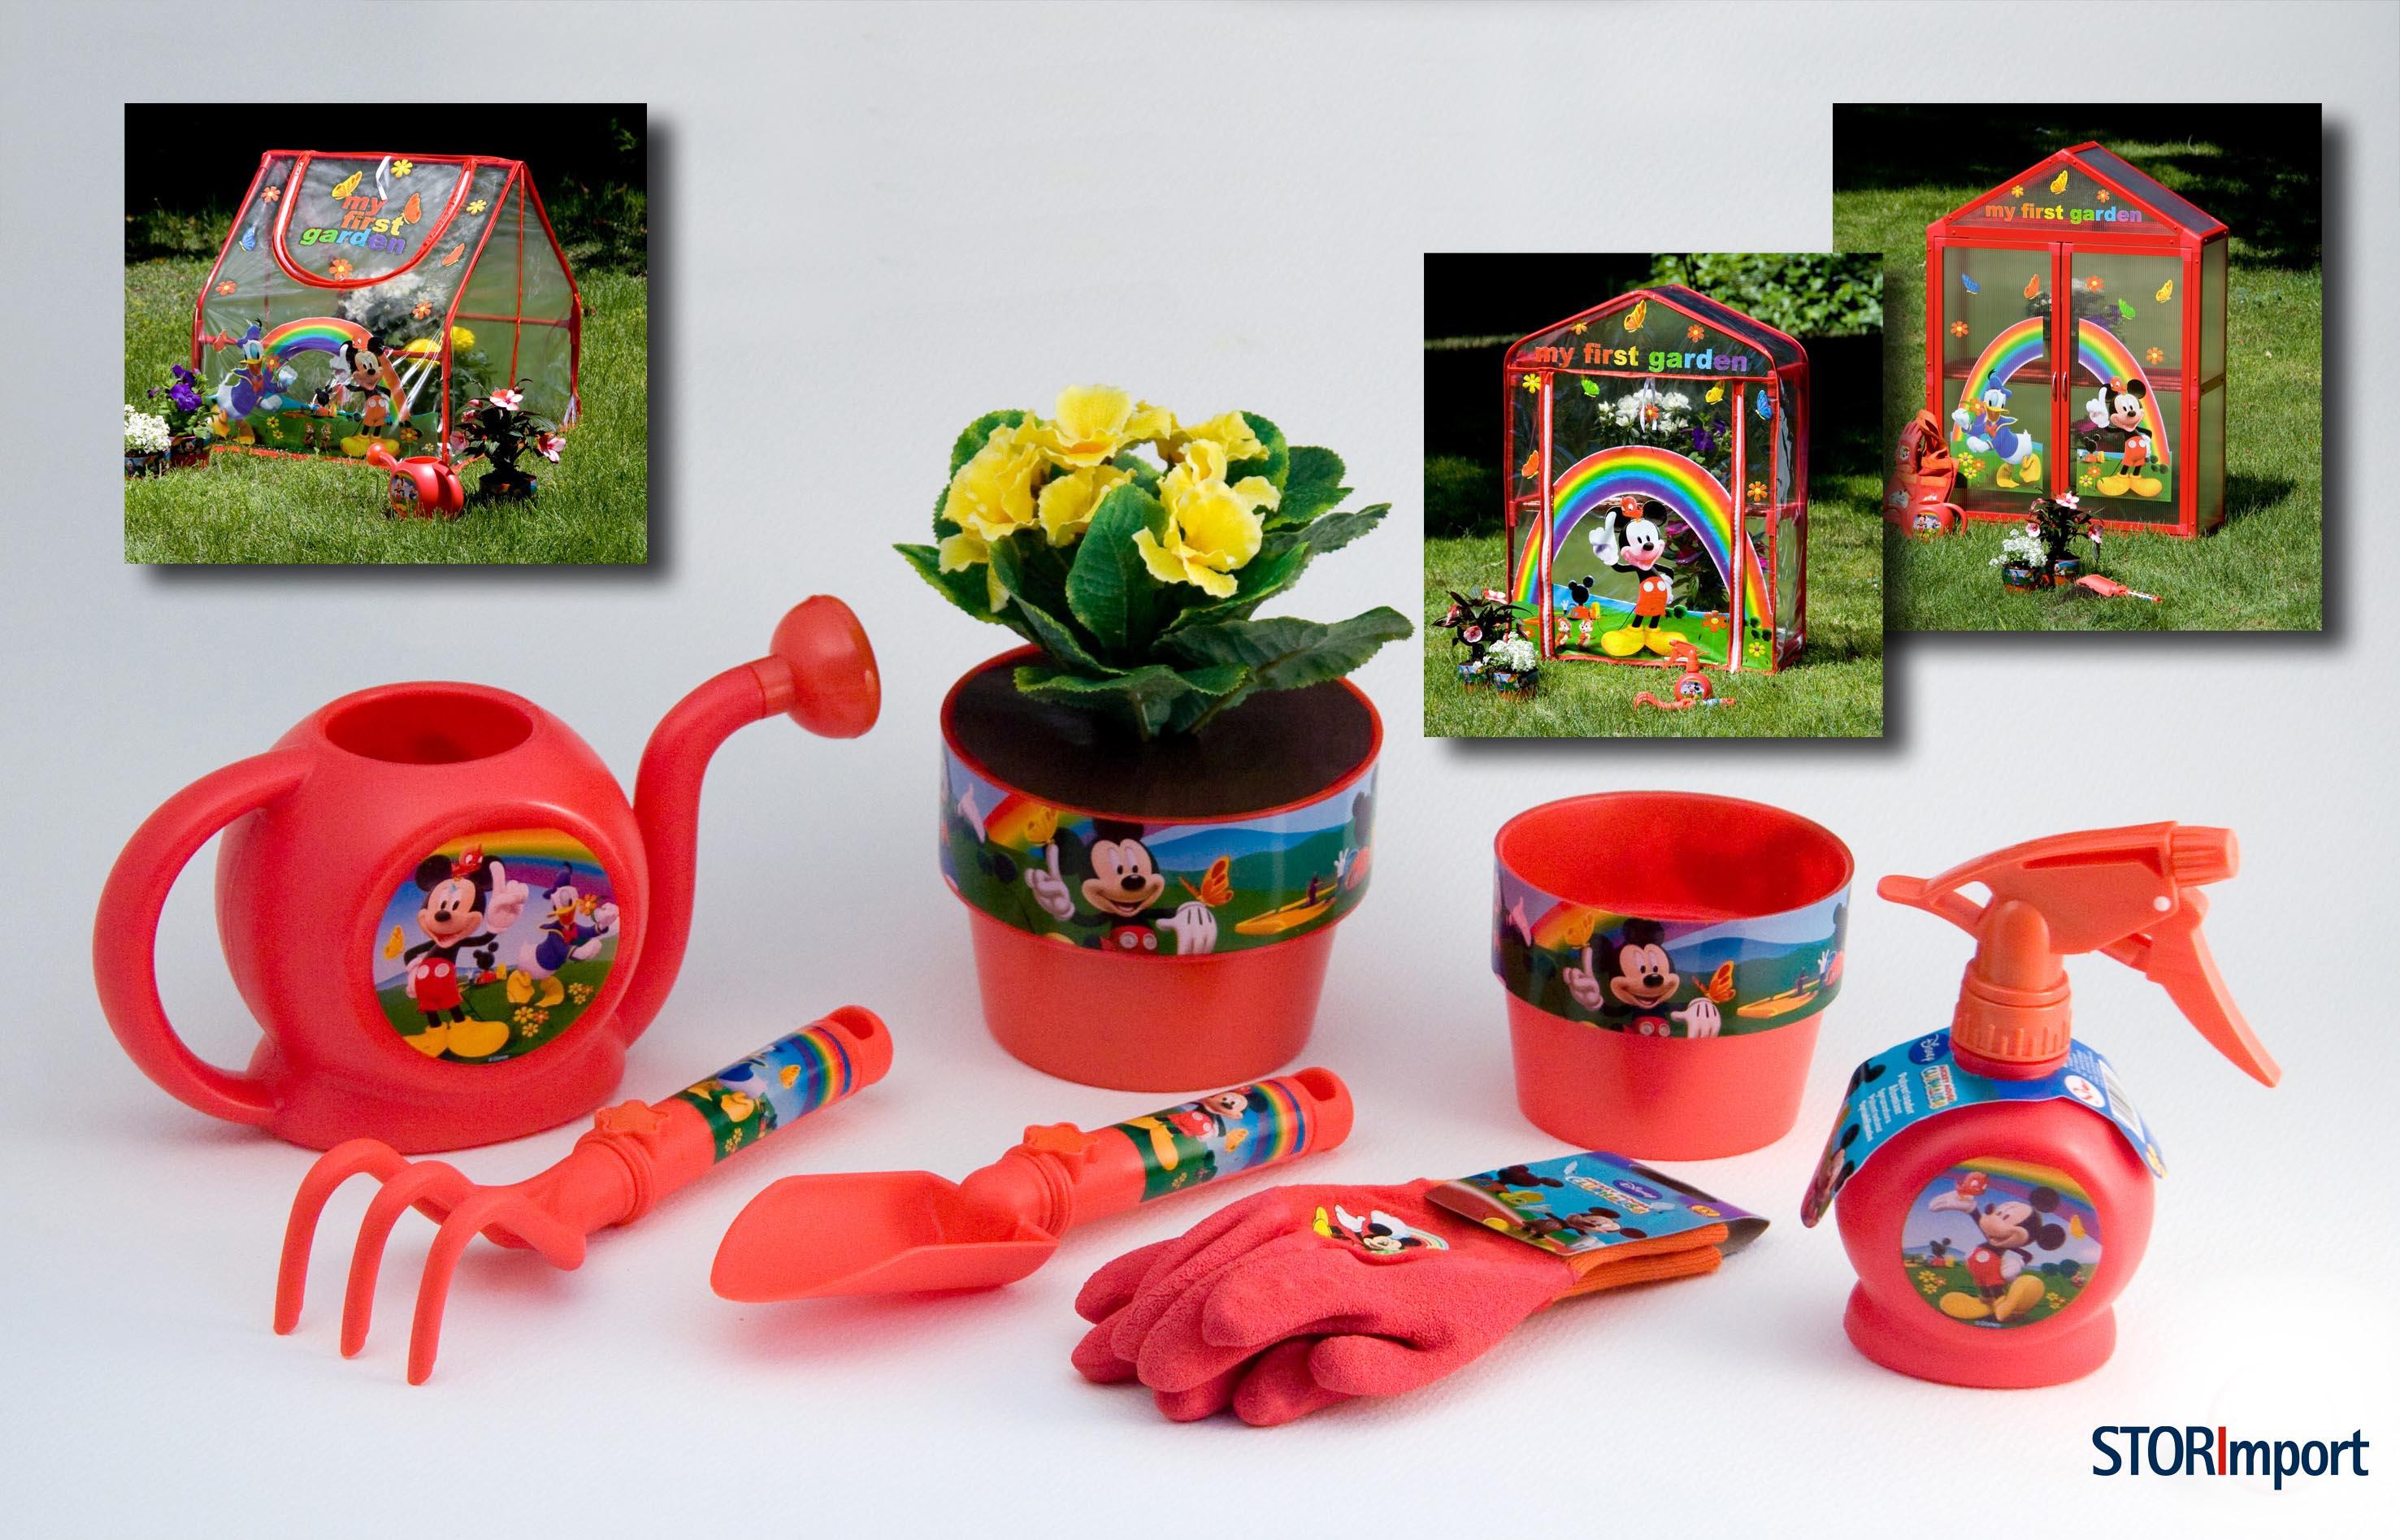 productos de jardineria infantiles stor